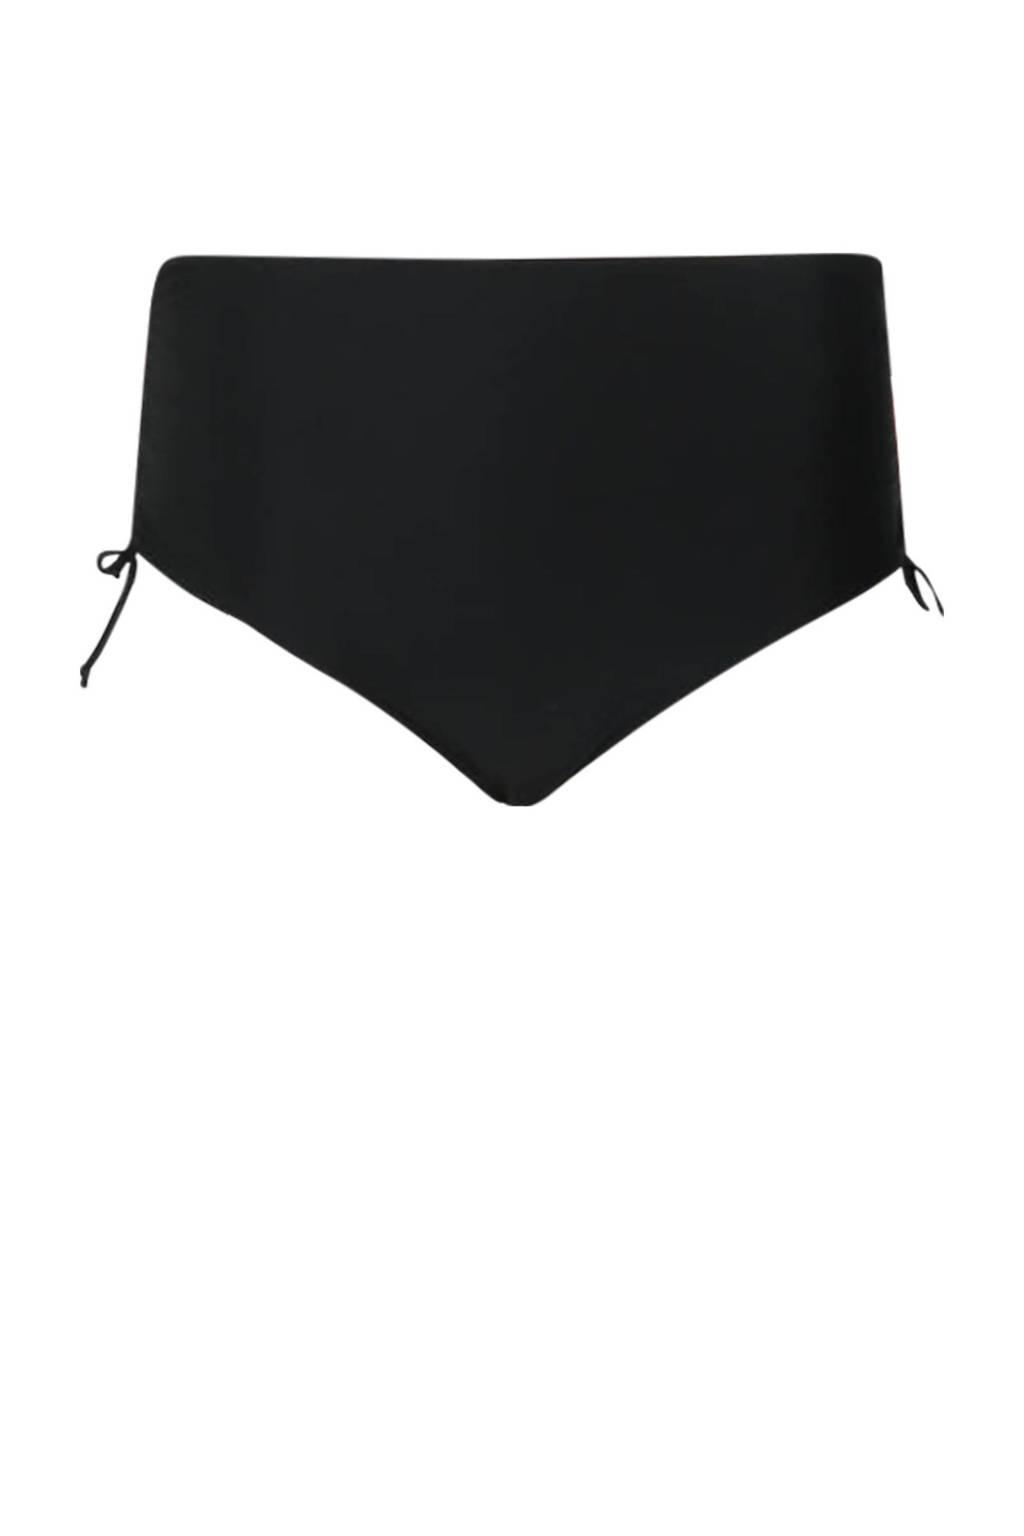 Paprika high waist bikinibroekje zwart, Zwart